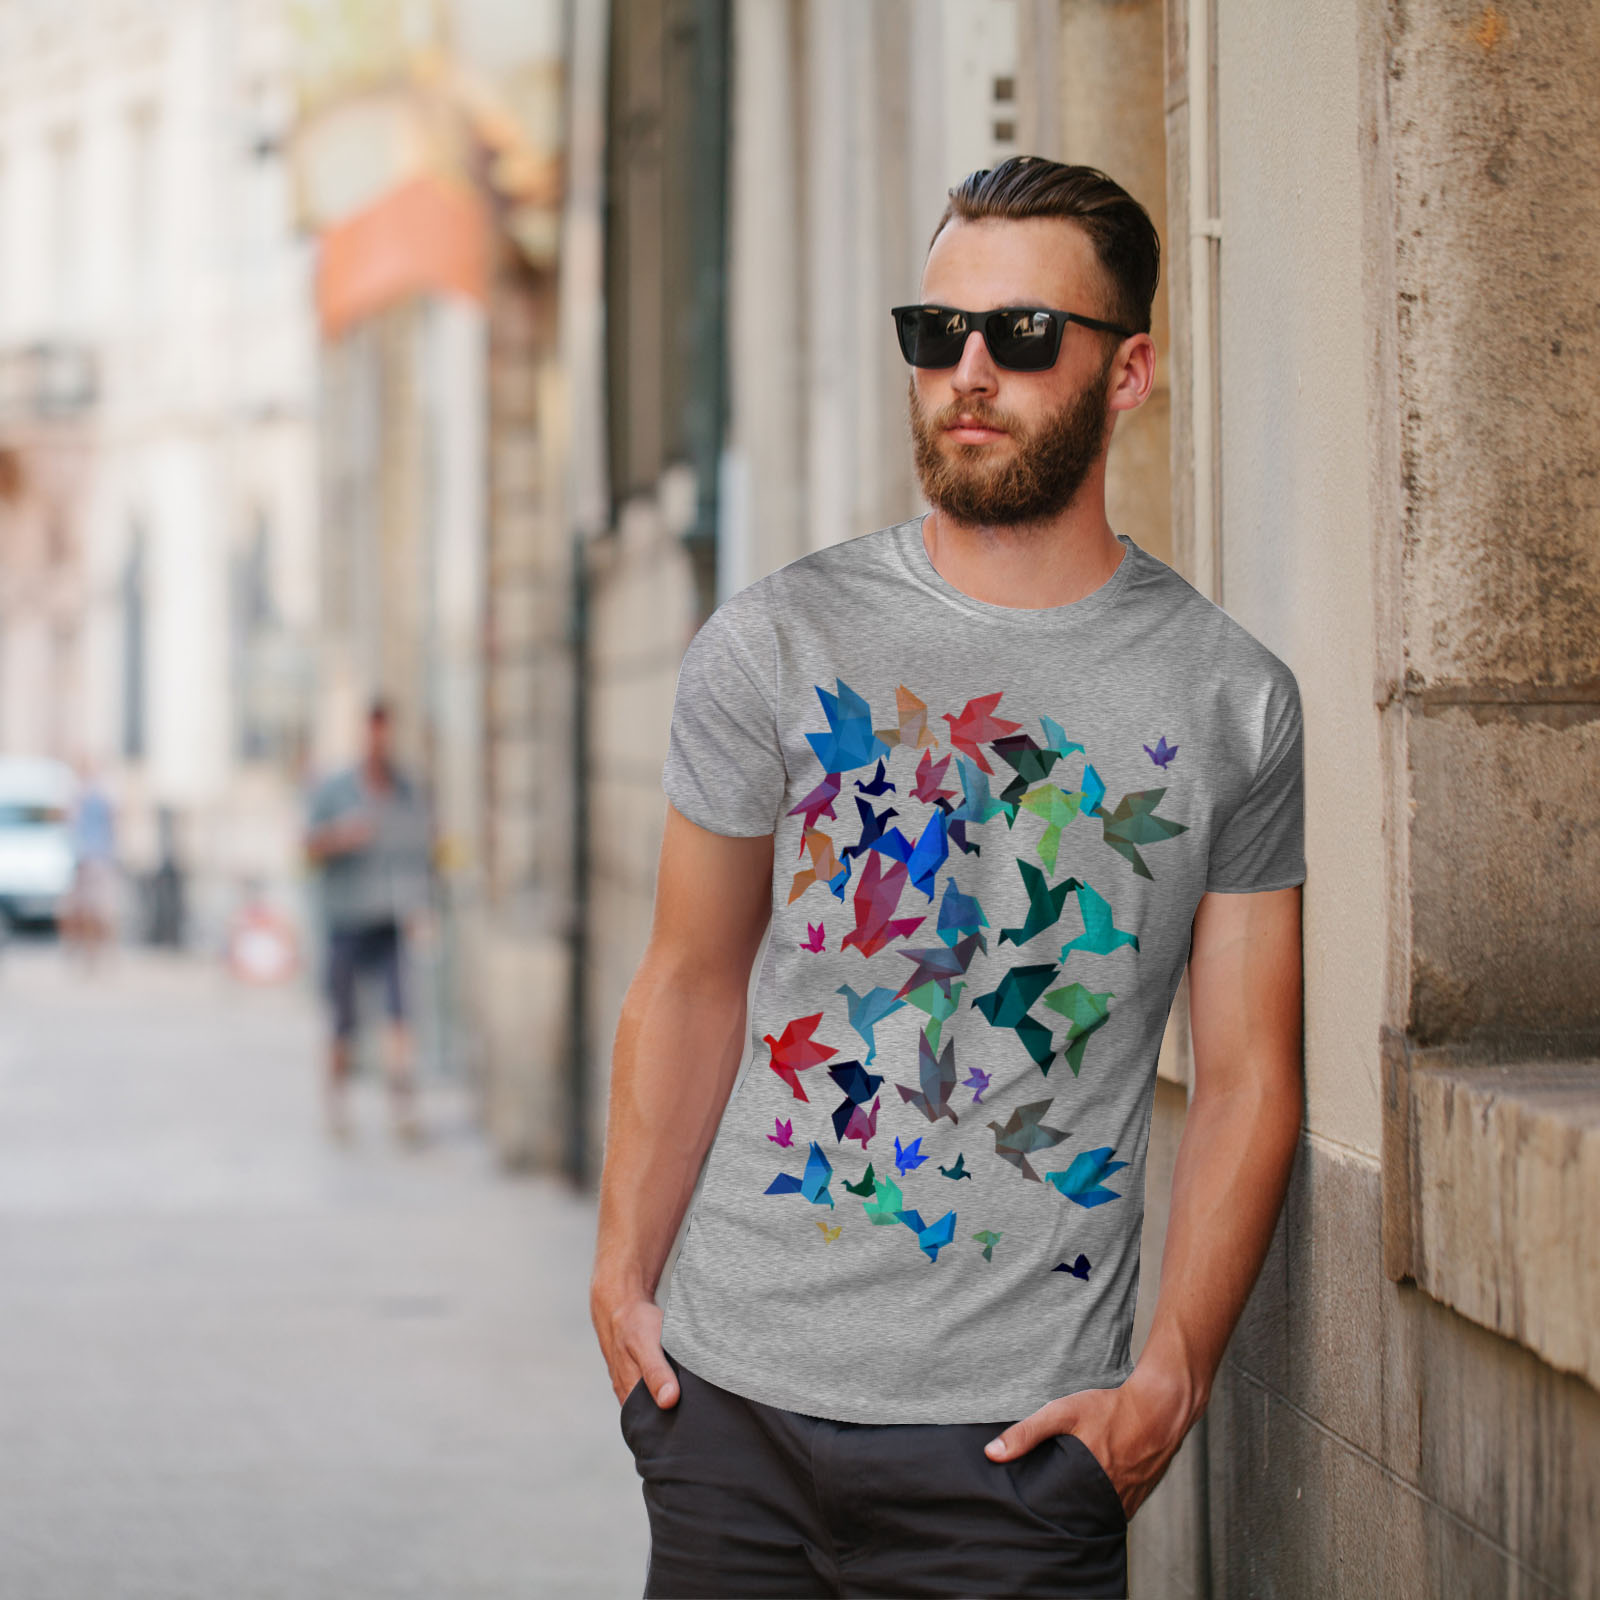 Wellcoda-Origami-Bird-Colors-Mens-T-shirt-Craft-Graphic-Design-Printed-Tee thumbnail 17